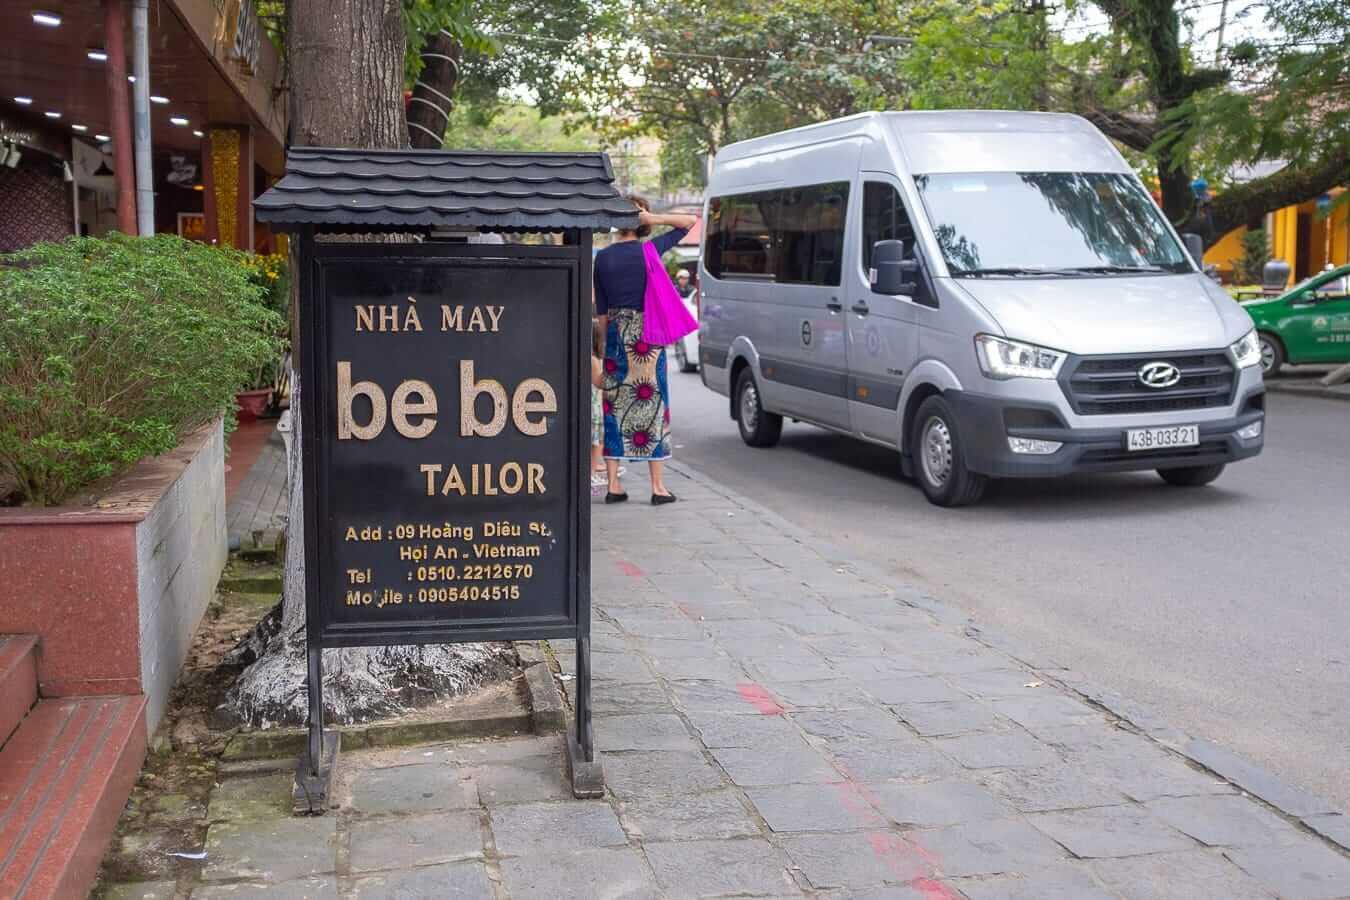 Bebe Tailors: Hoi An bus station